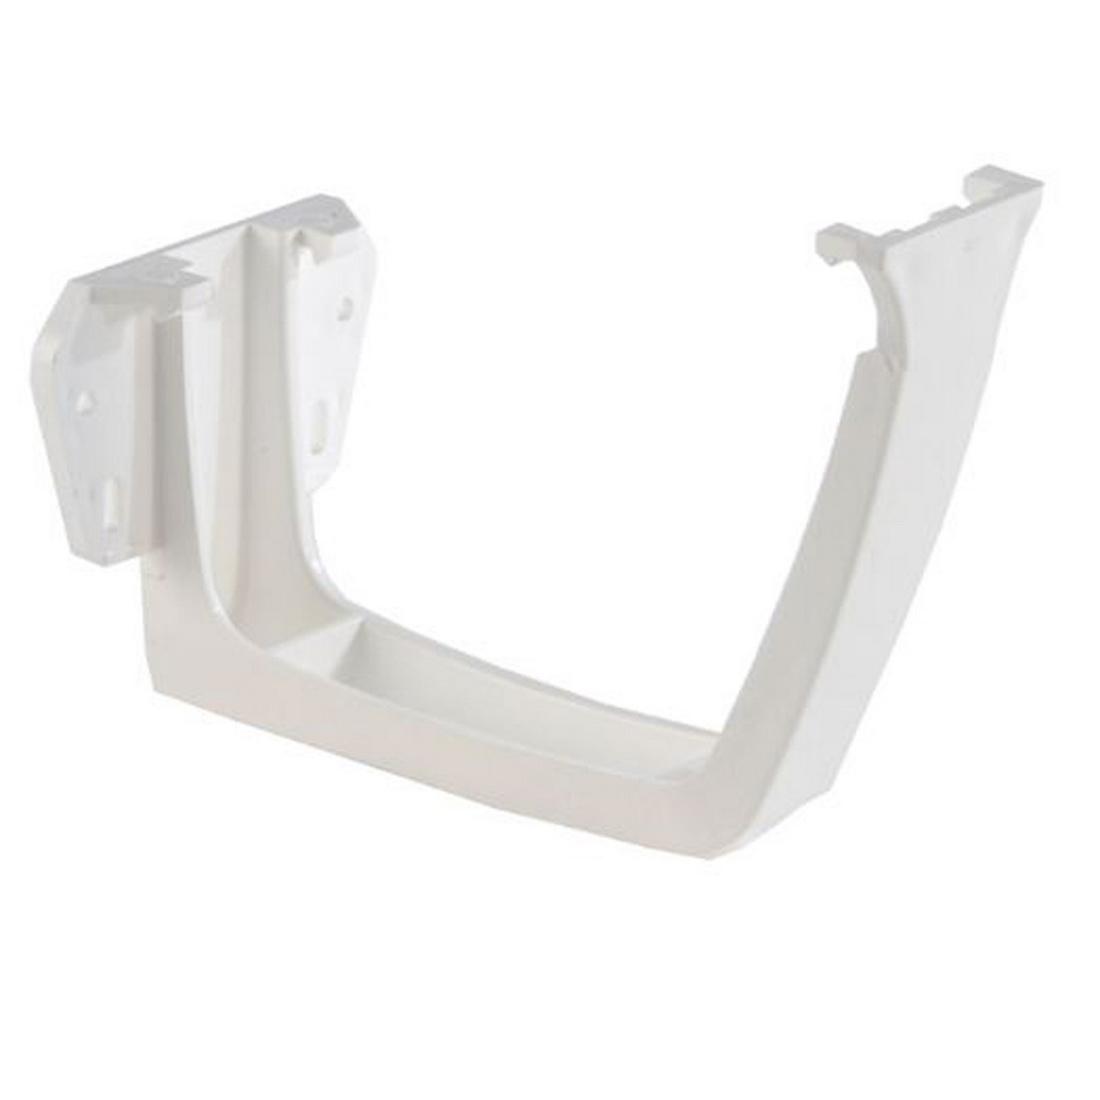 Marley Flowline Secure External Bracket White FL2E